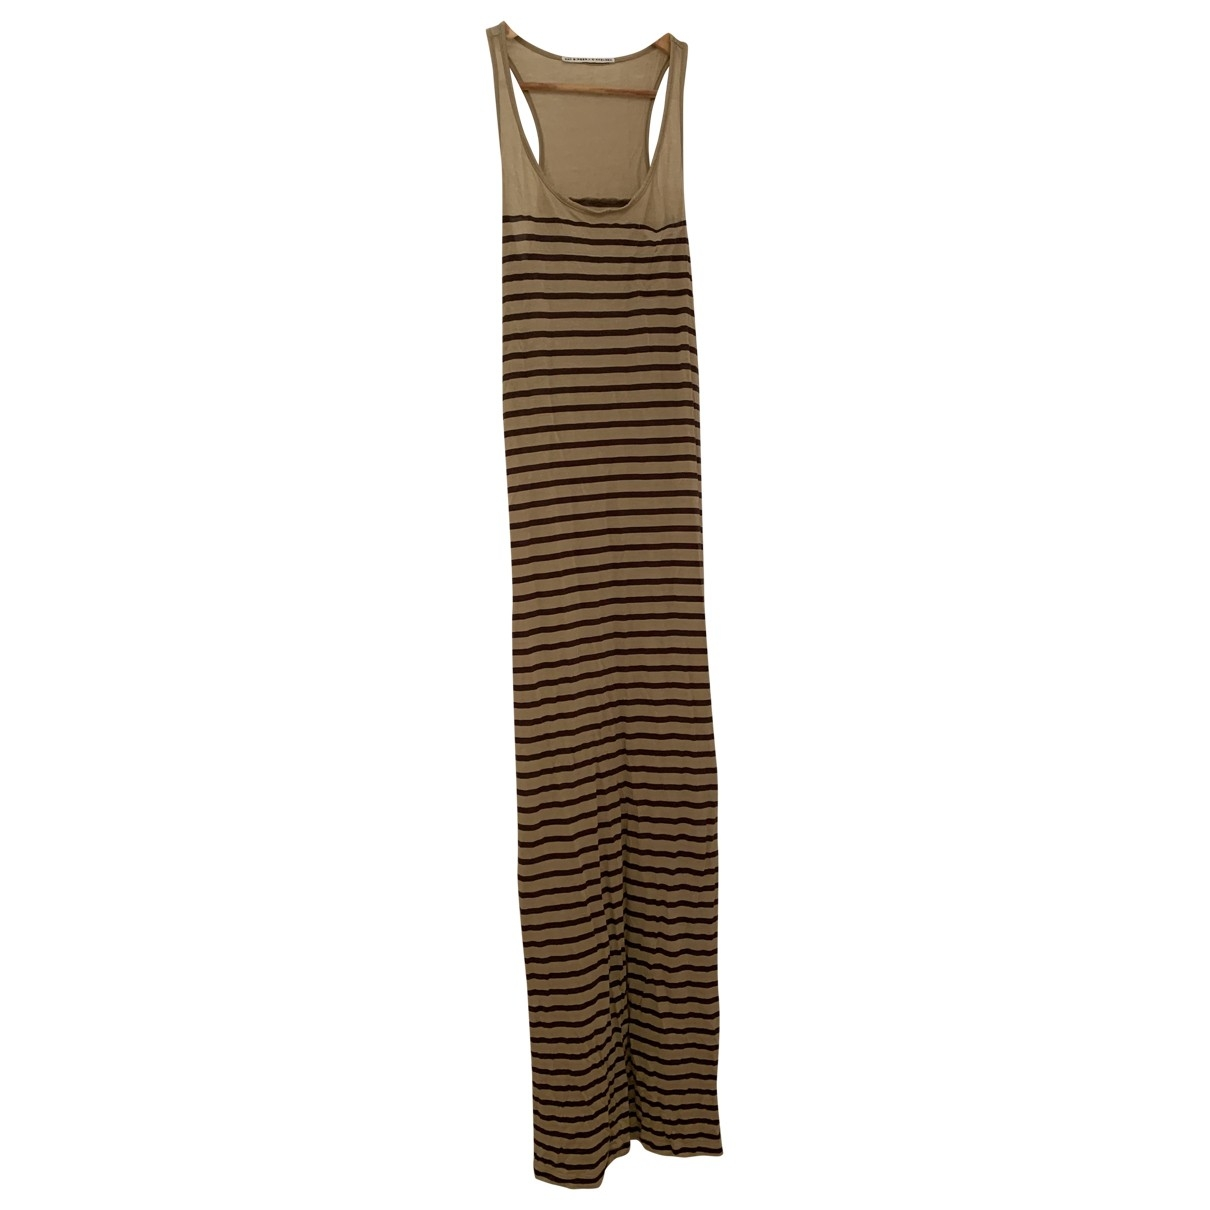 Day Birger & Mikkelsen \N Beige dress for Women L International